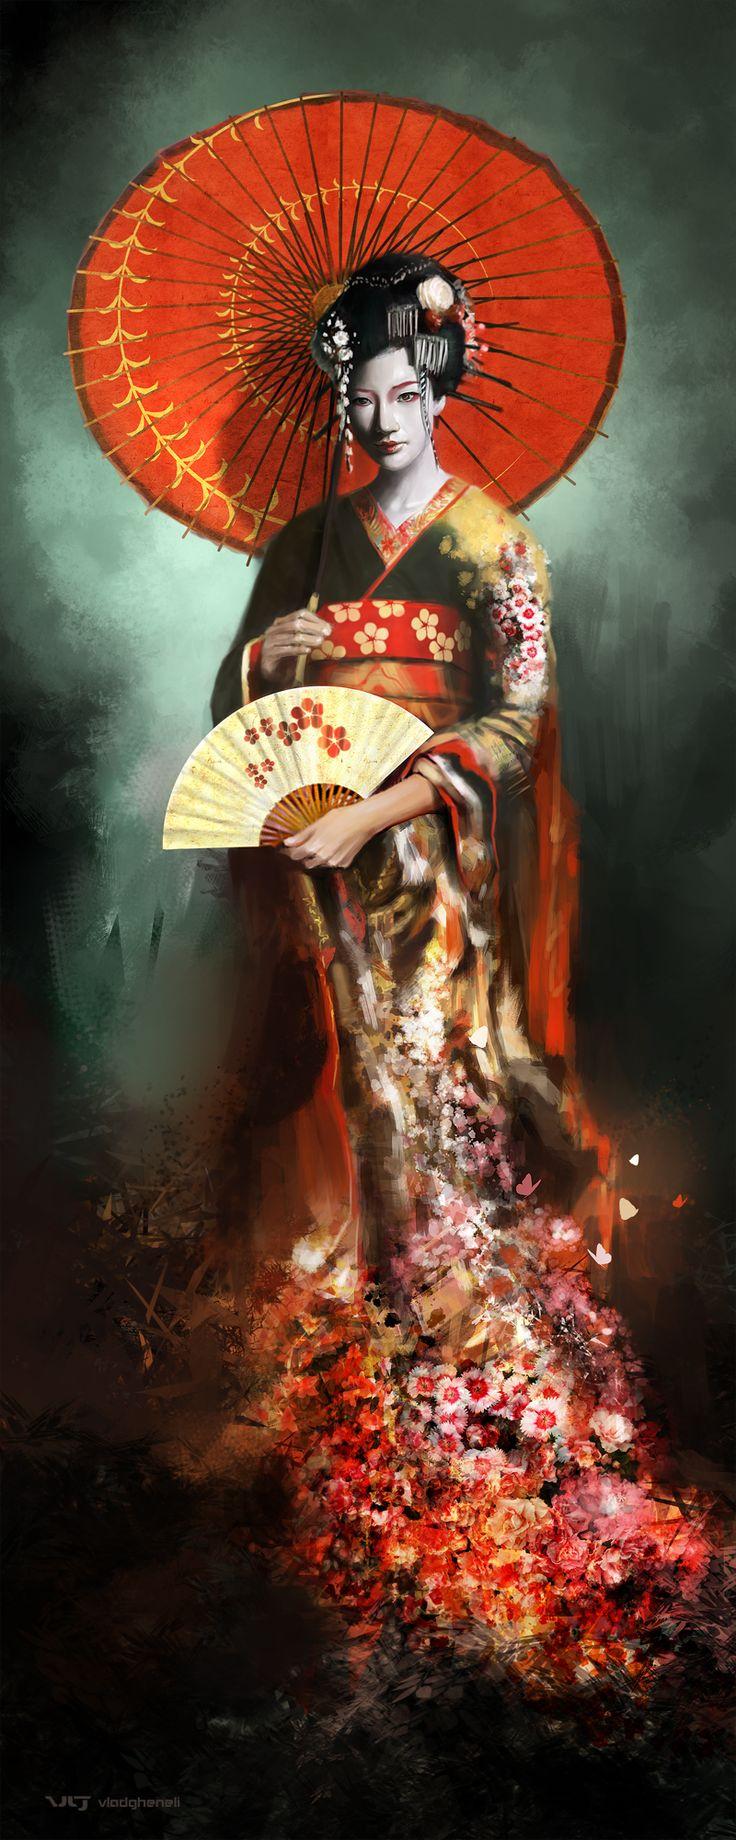 wallpaper geisha corals girl - photo #30